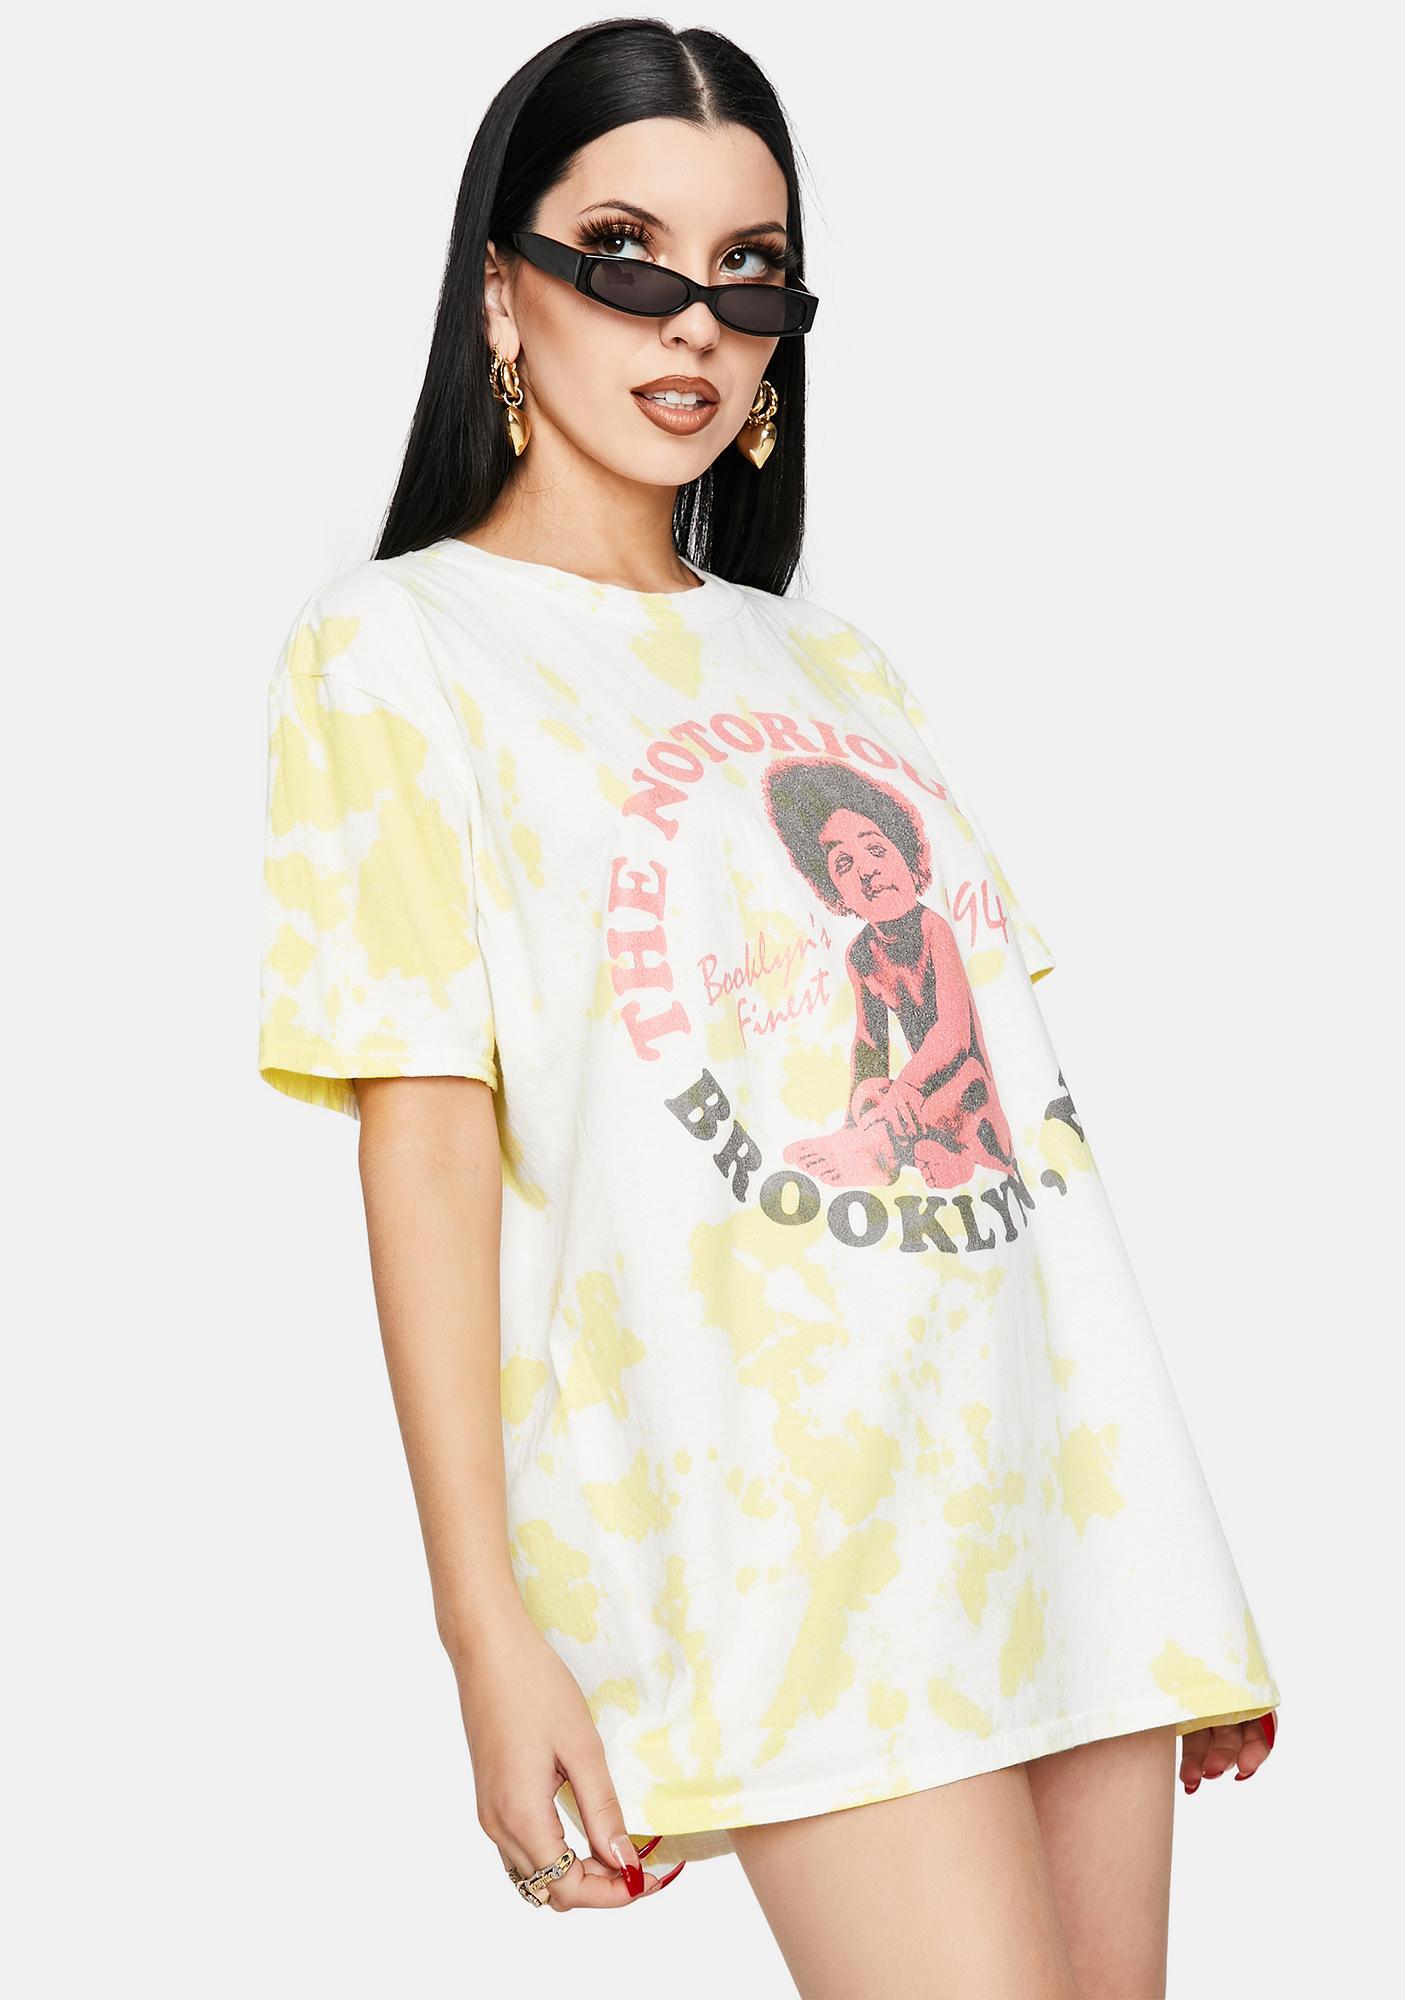 Daisy Street Notorious B.I.G. Tie Dye Graphic Tee